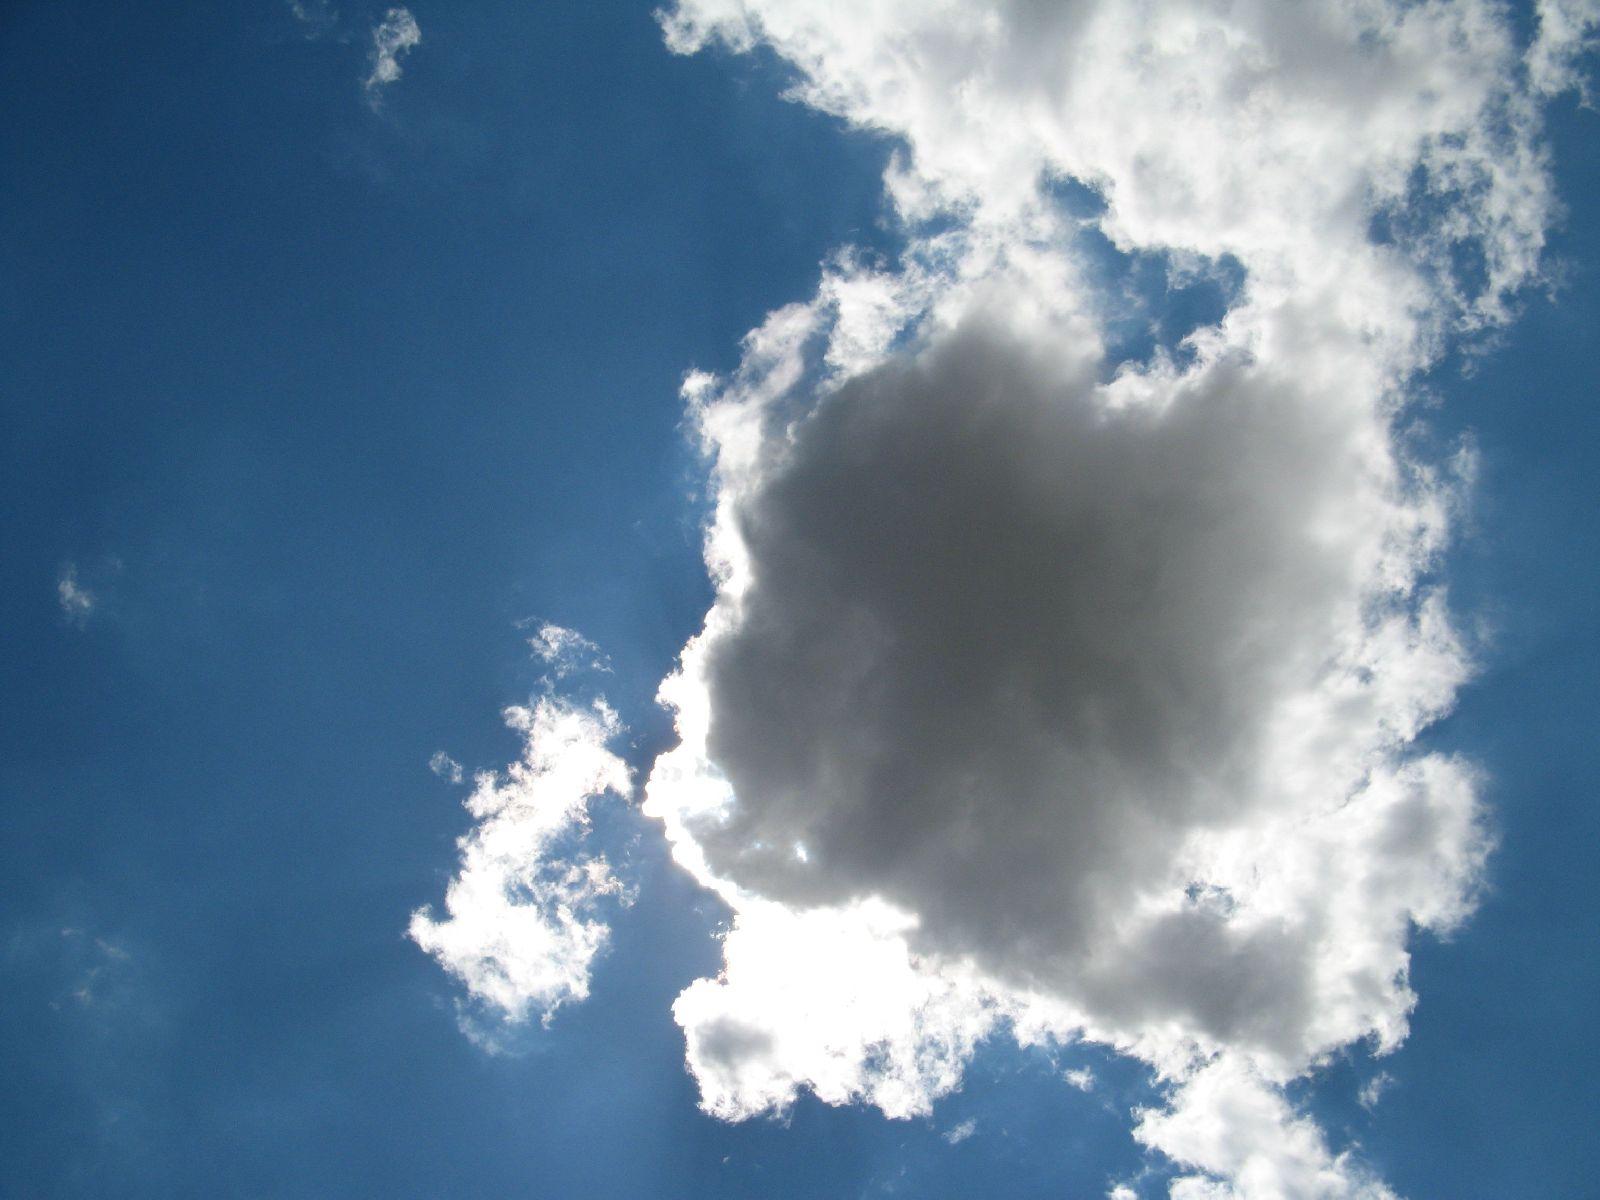 Himmel-Wolken-Foto_Textur_B_01004